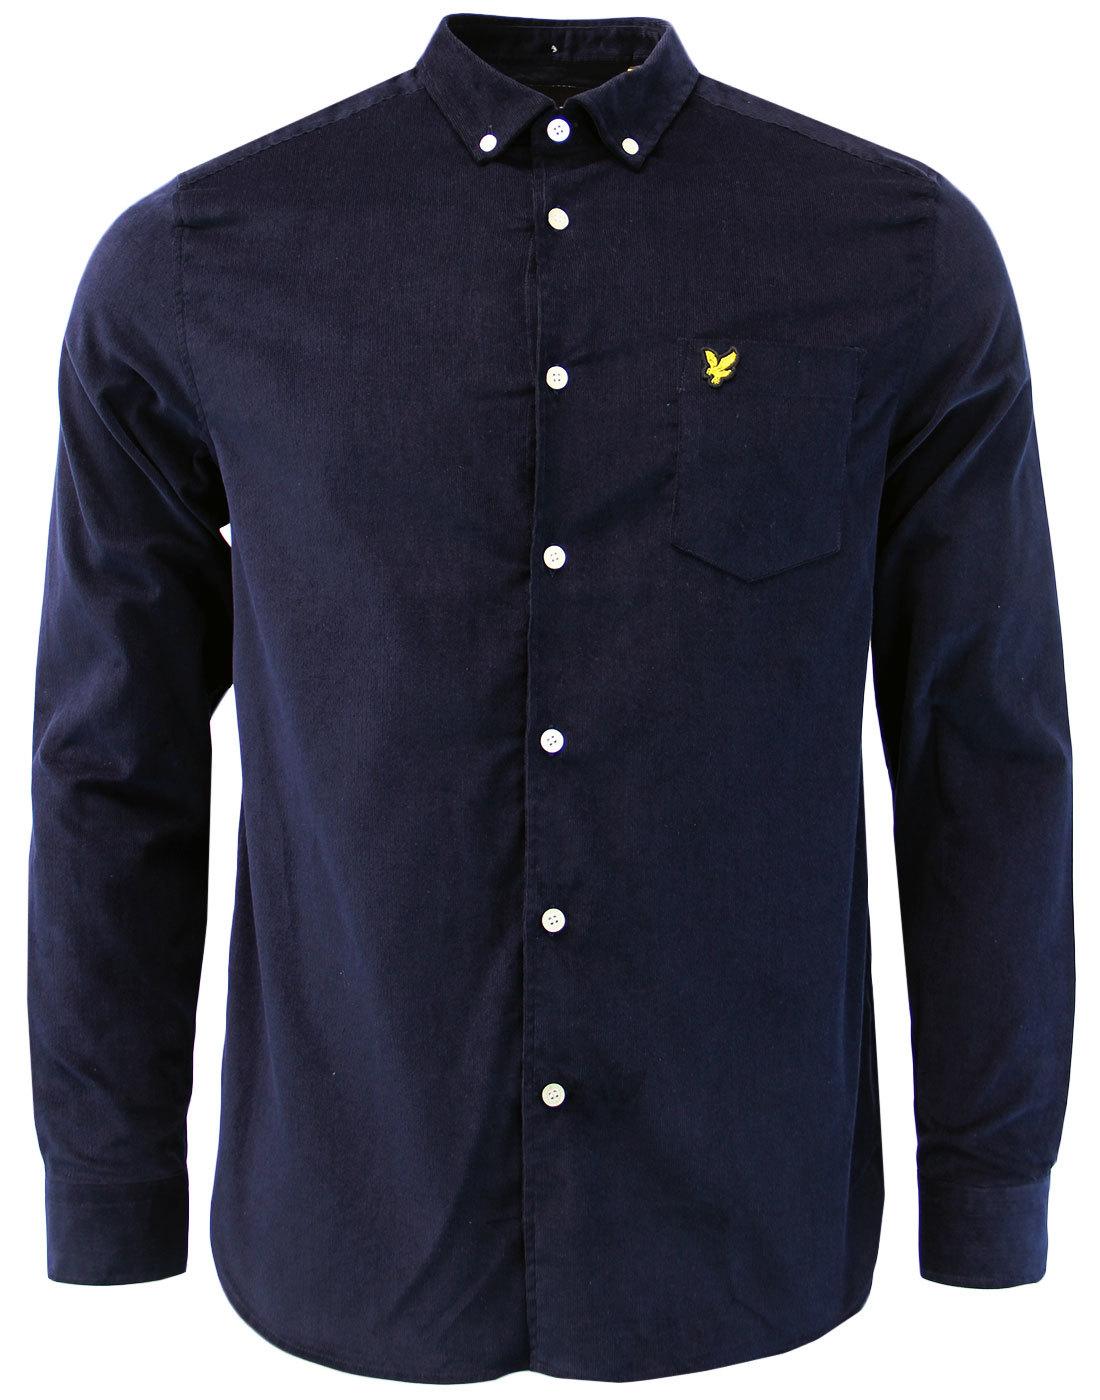 LYLE & SCOTT Retro Mod Mini Cord Oxford Shirt NAVY